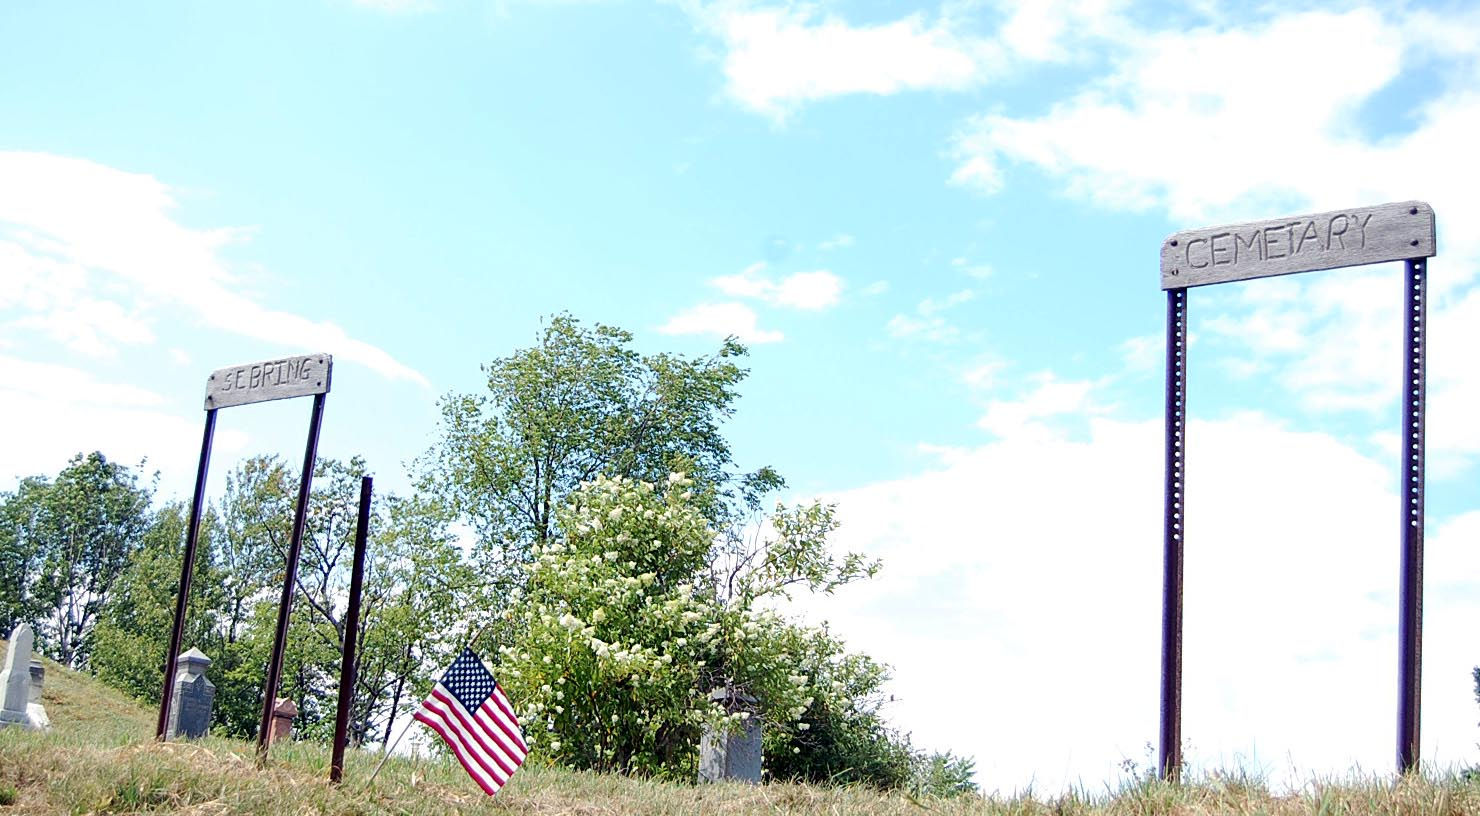 Sebring Cemetery